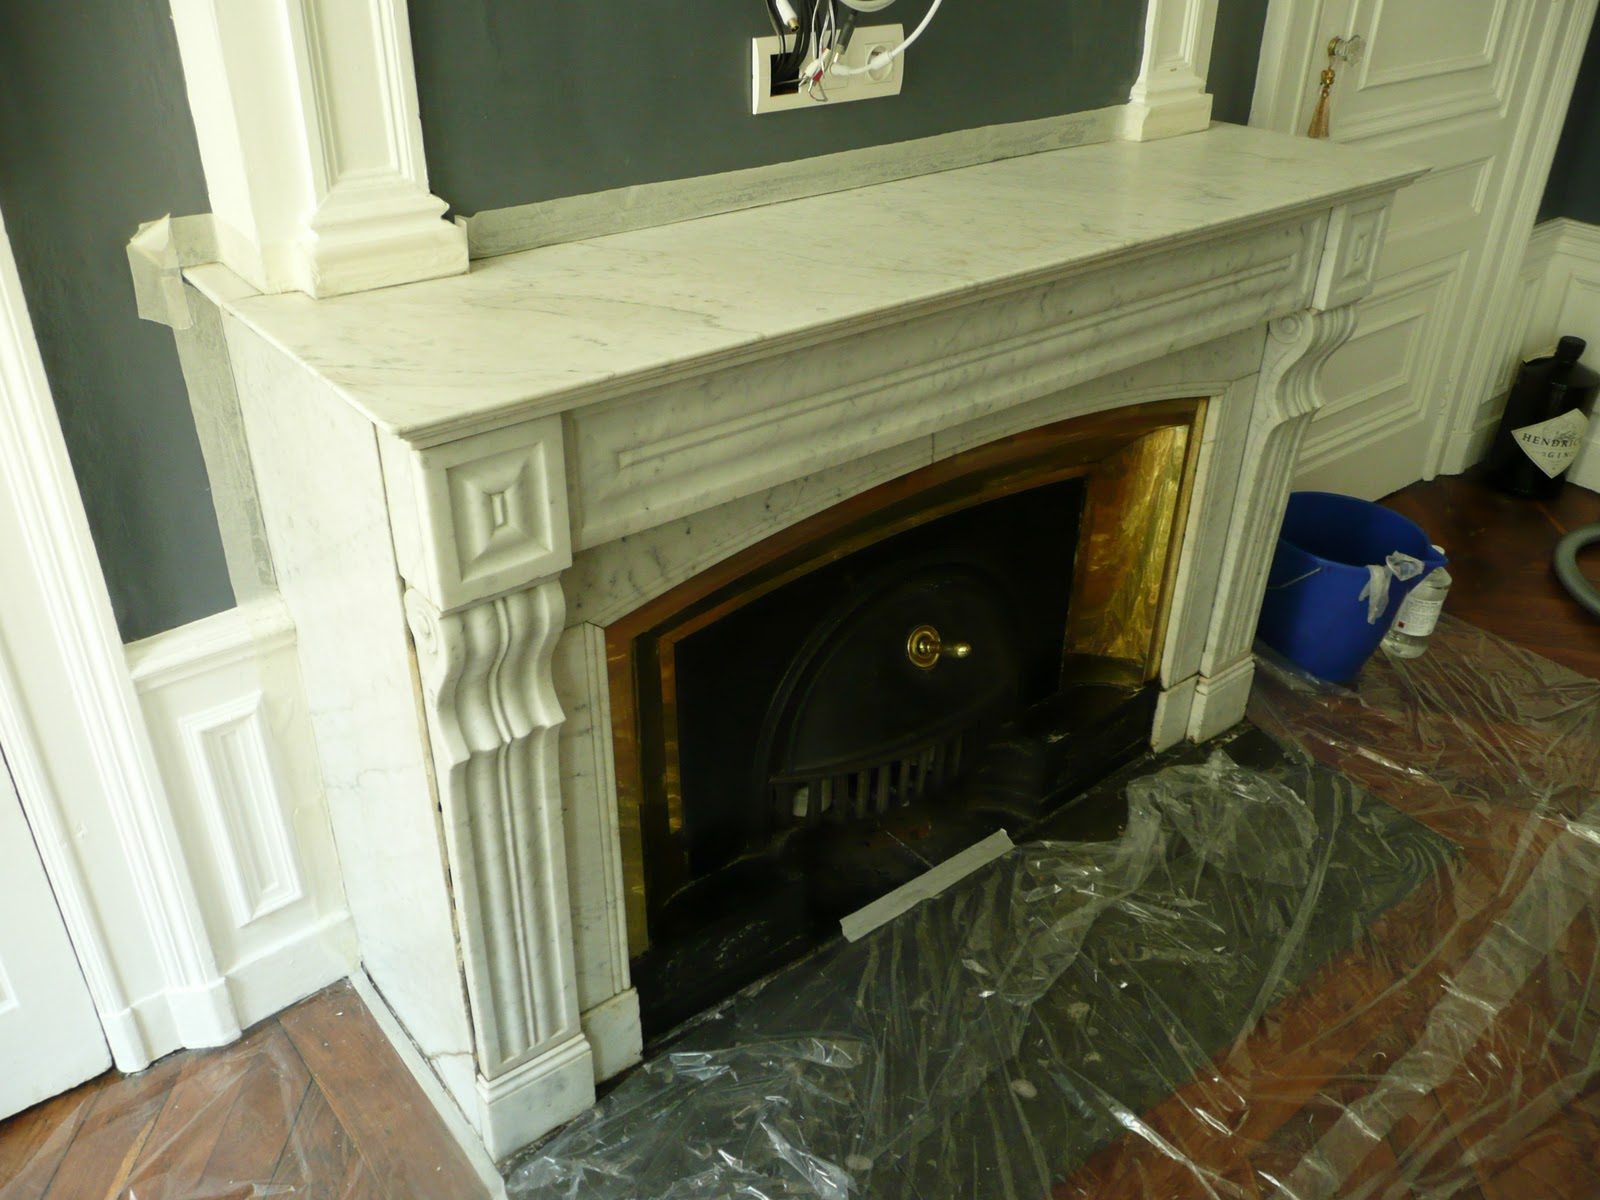 restauration de meubles et objets domicile sur lyon et sa r gion lustrage du marbre. Black Bedroom Furniture Sets. Home Design Ideas